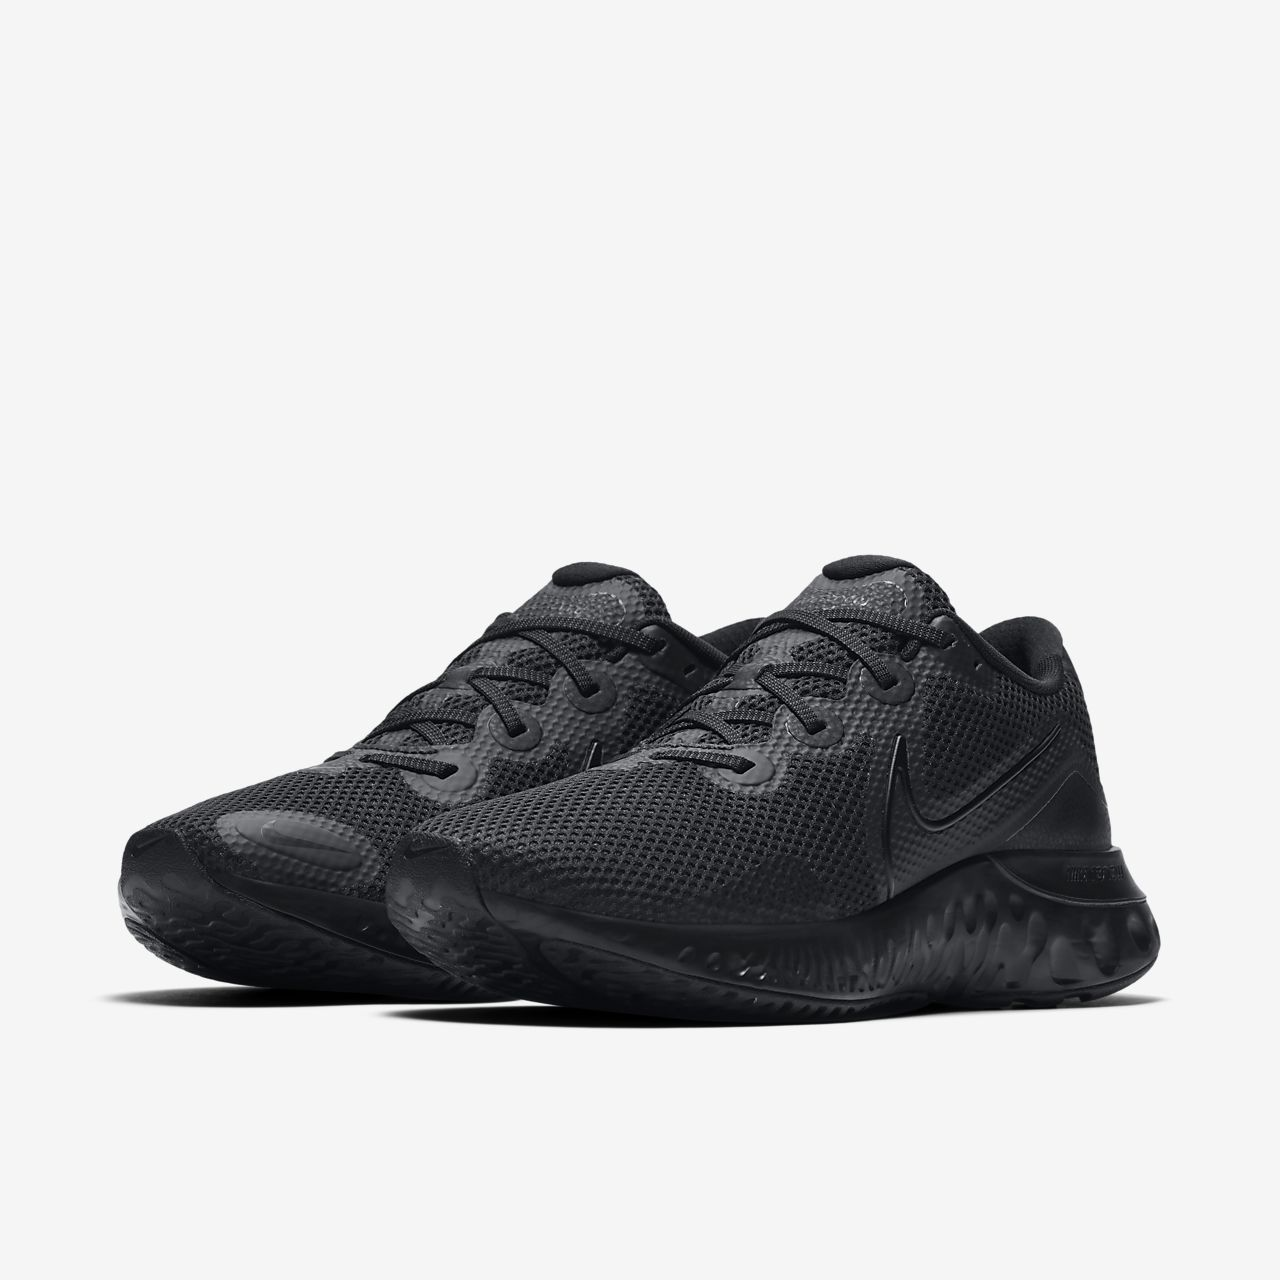 Sapatilhas de running Nike Renew Run para mulher